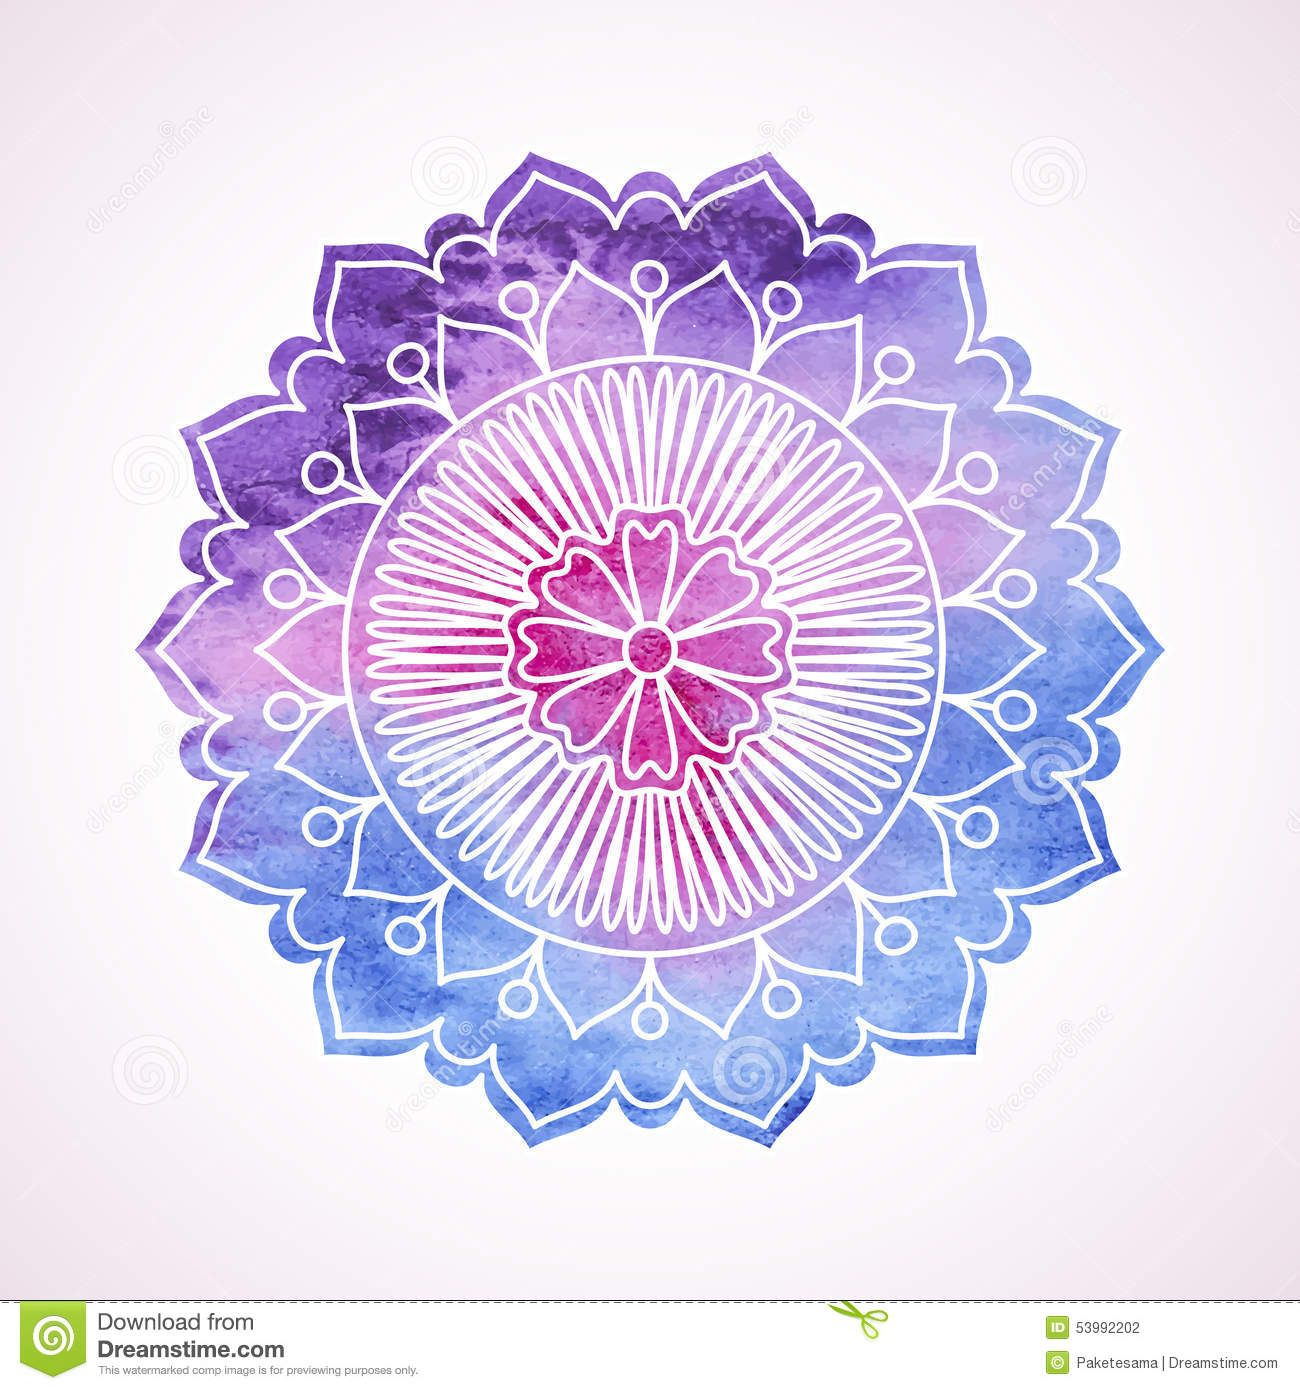 yoga logo mandala - Google Search